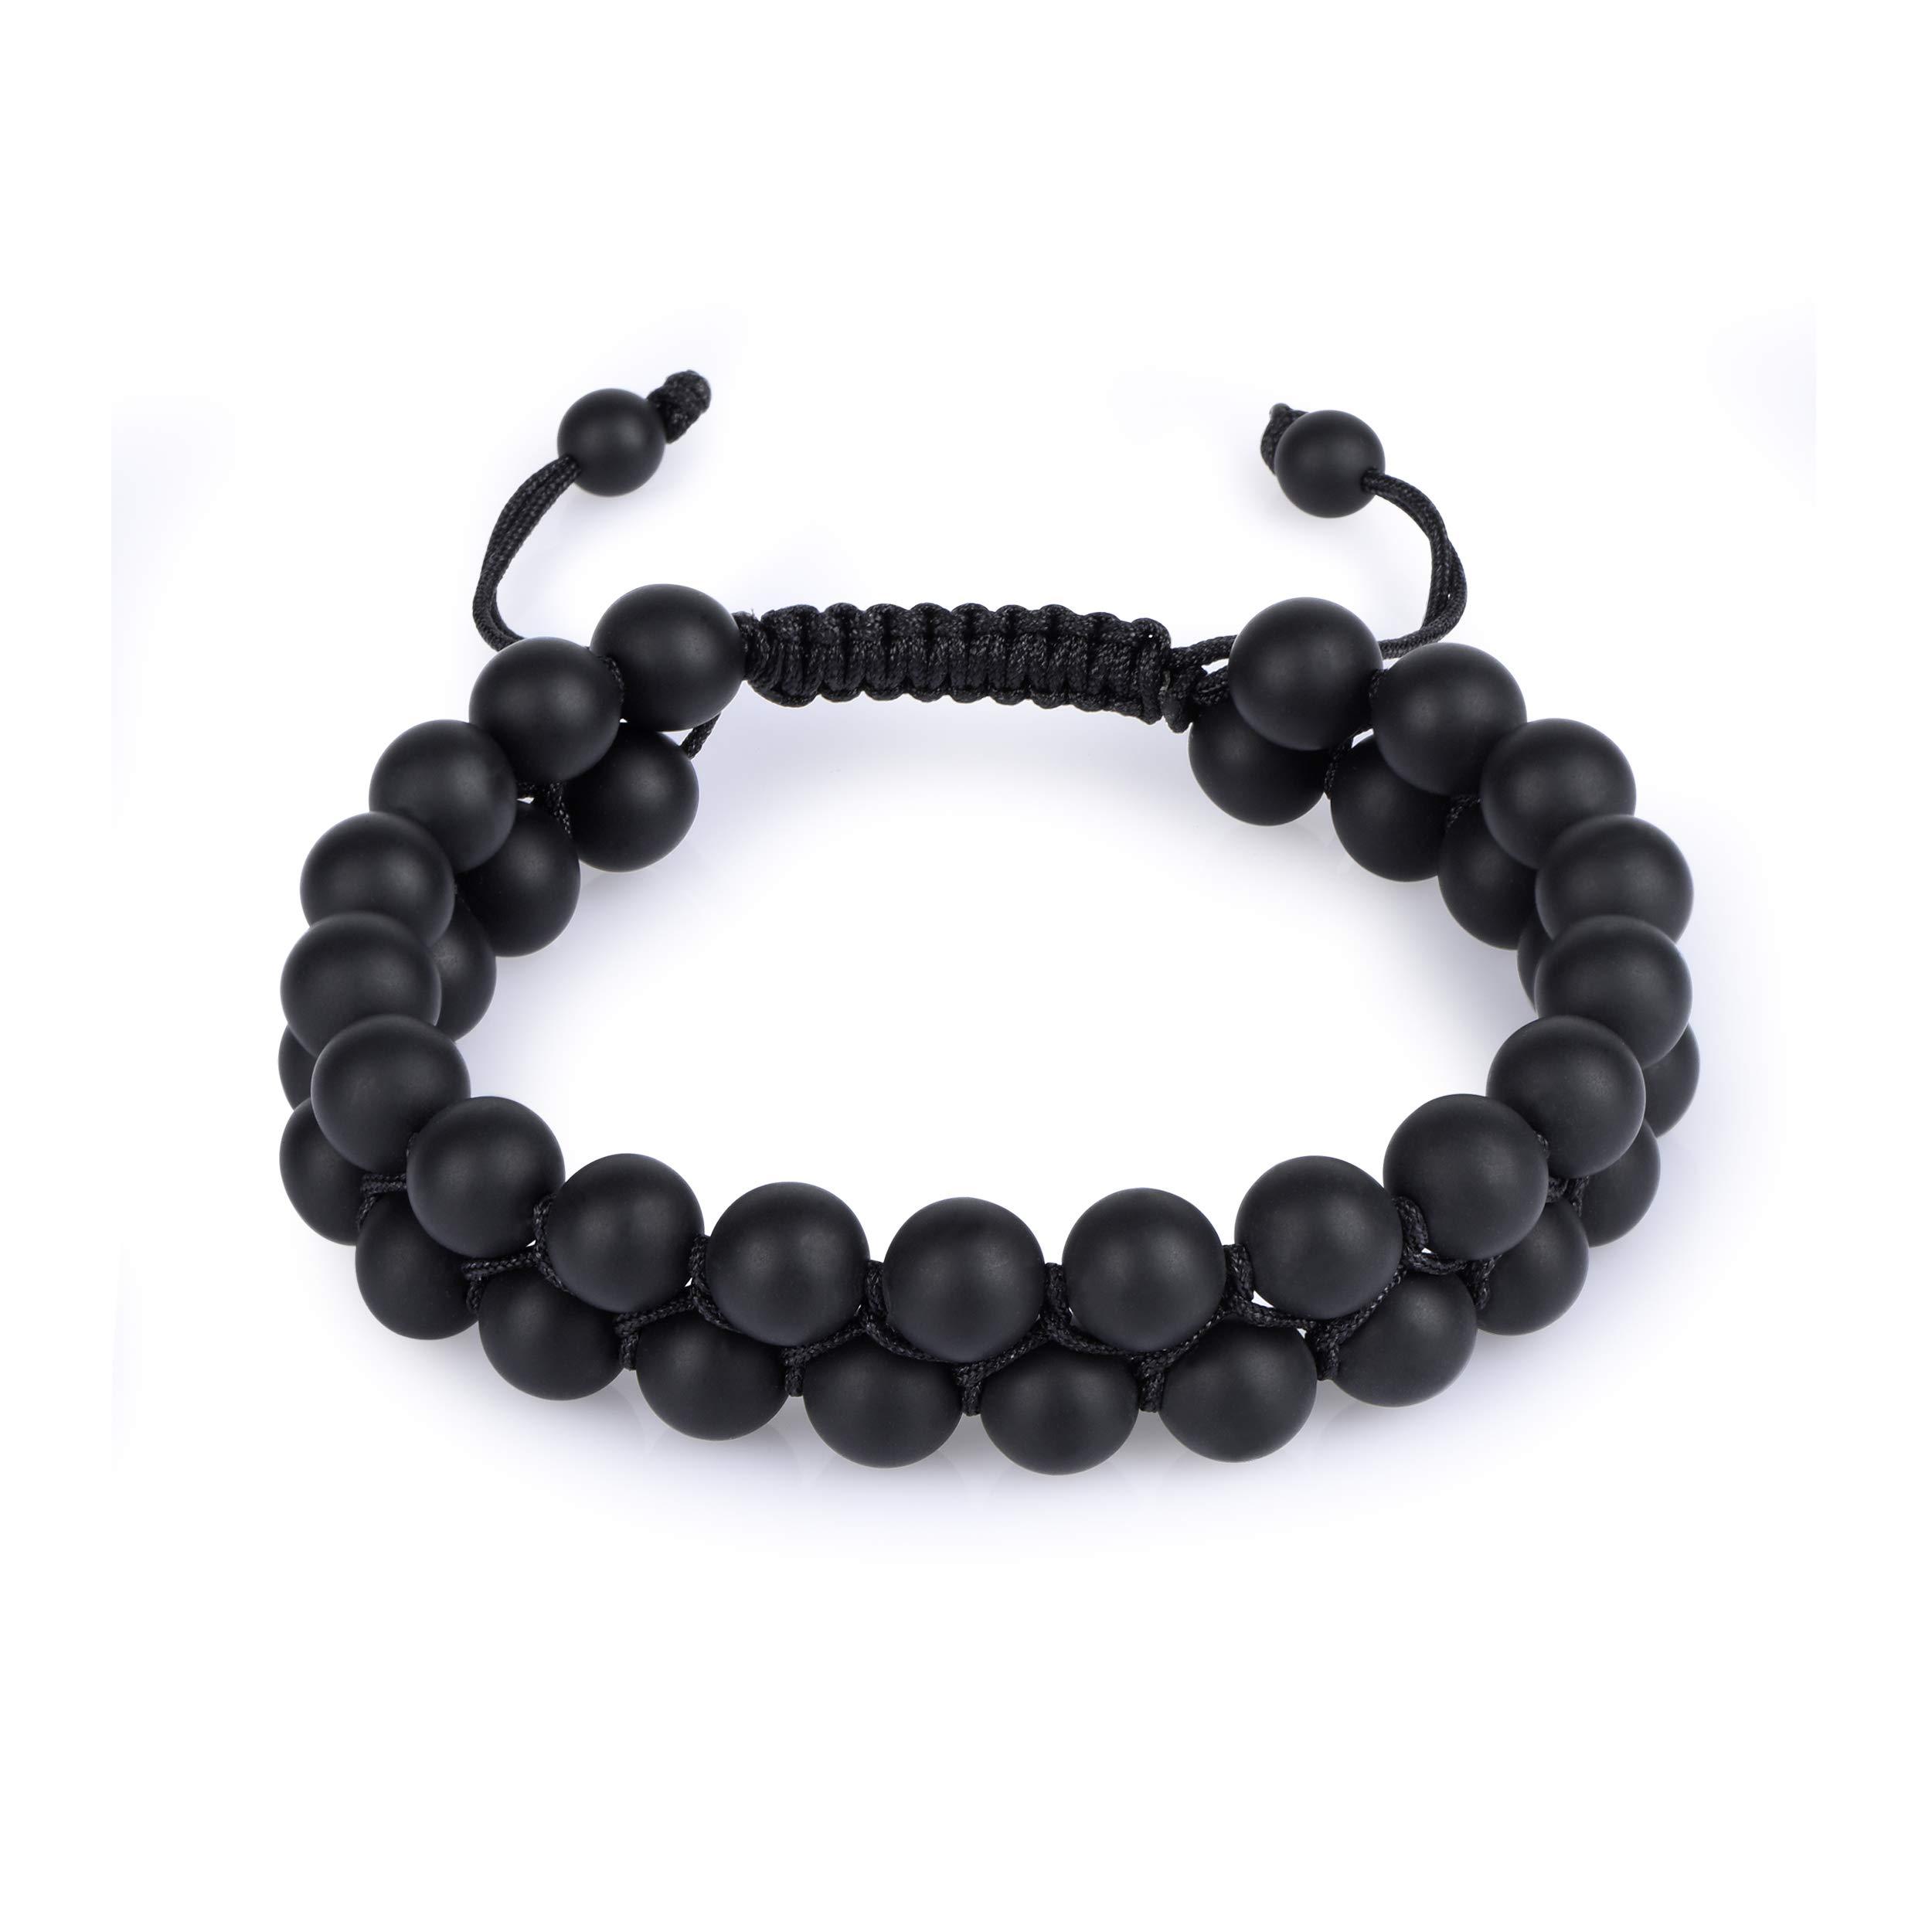 HASKARE Tiger Eye Stone Bracelet Men Women - Natural Energy Stone Essential Oil Lava Rock Black Onyx Tiger Eye Beads Bracelet Adjustable Couples (Onyx)